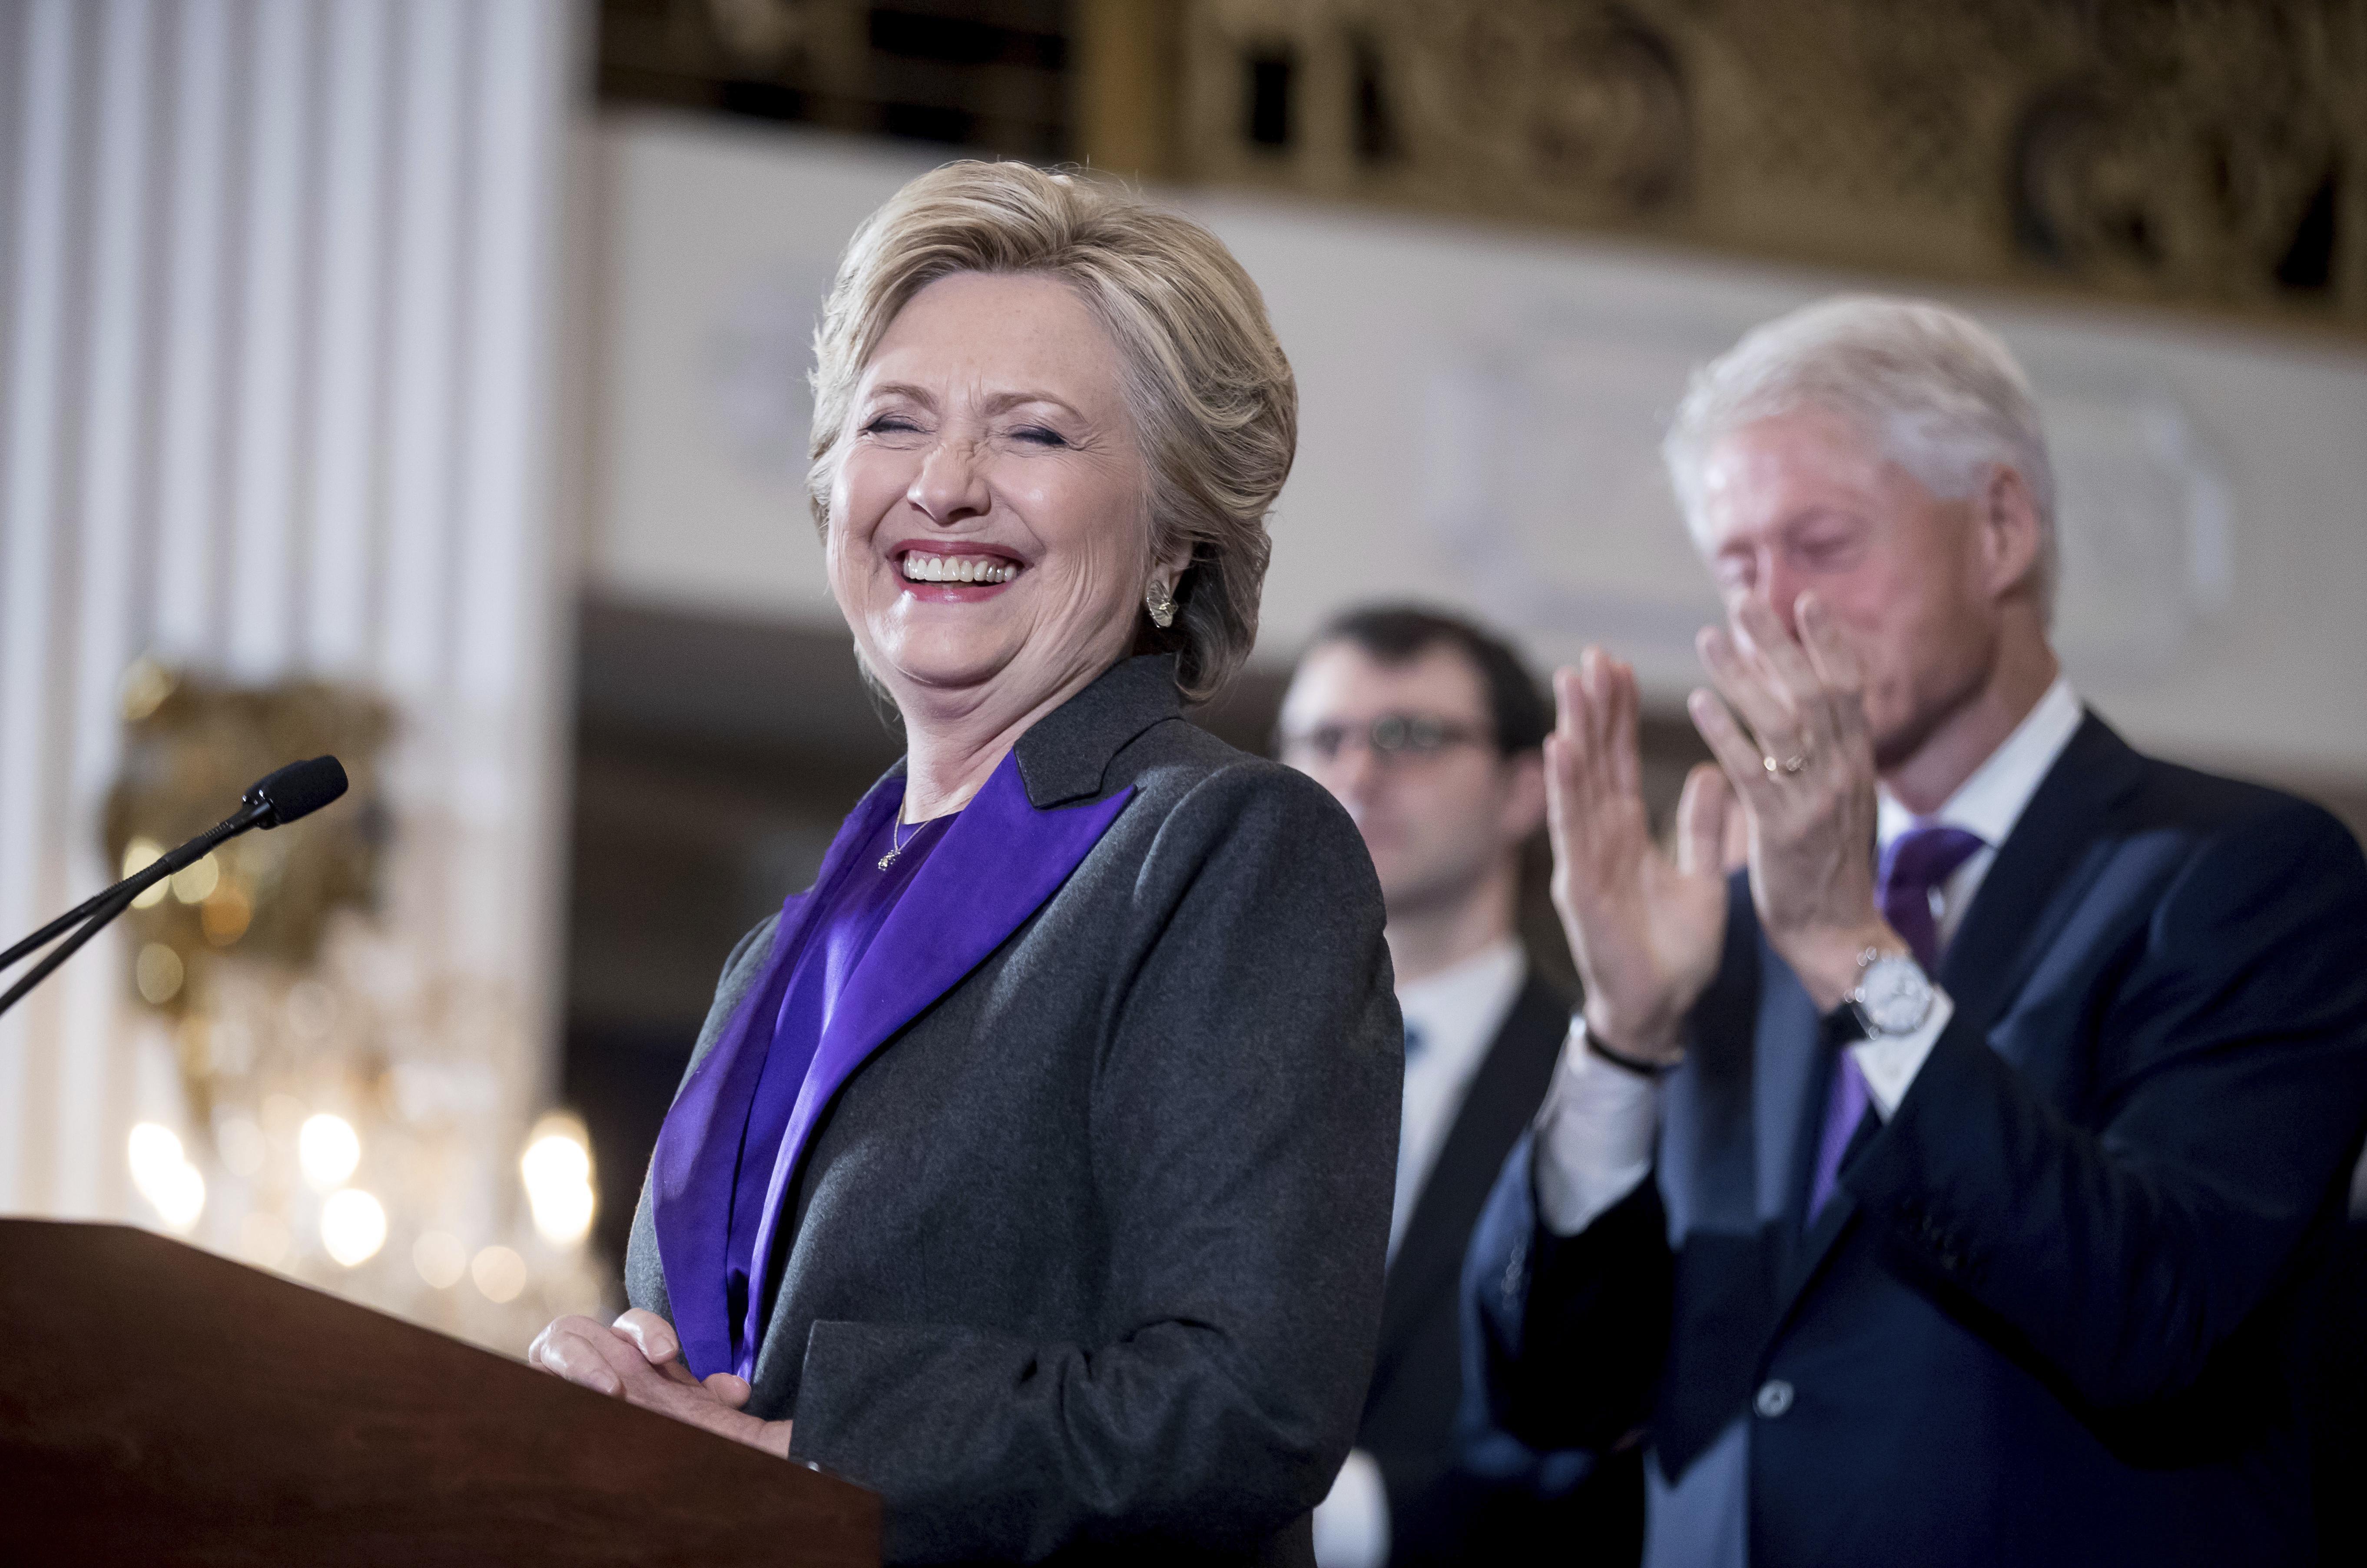 Jesse Jackson urges Obama to issue pardon for Clinton